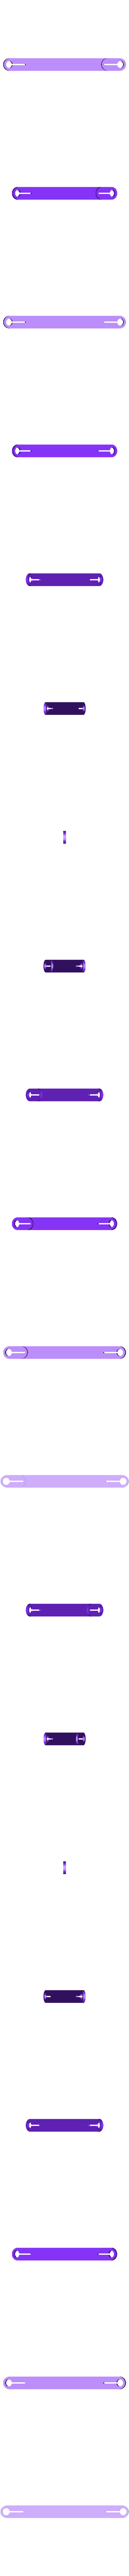 10cm_Strap_Holes.stl Download free STL file Flexible Filament Bikini Top and Bottom • 3D printable design, SexyCyborg